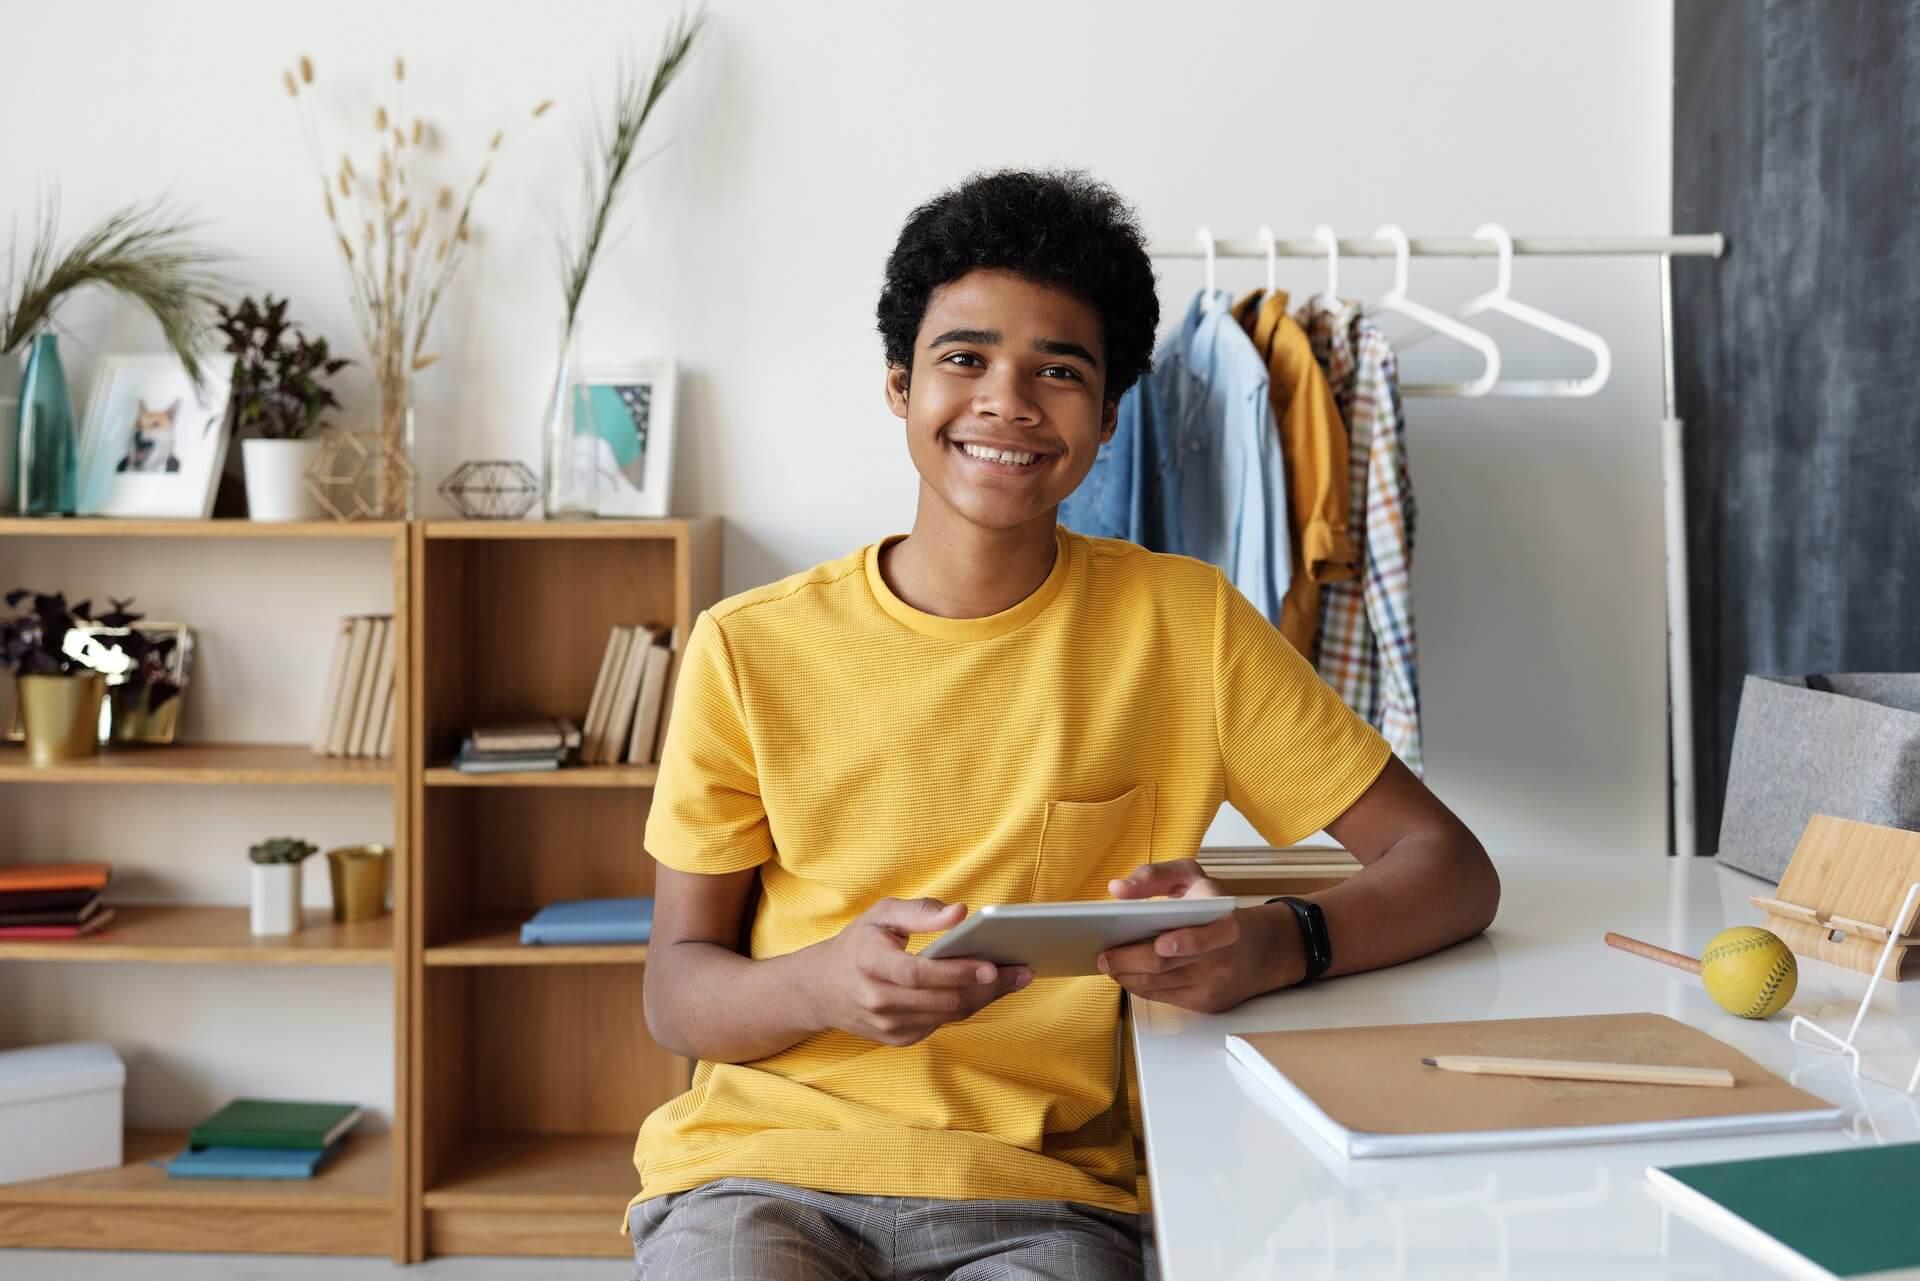 Kid smiling holding iPad